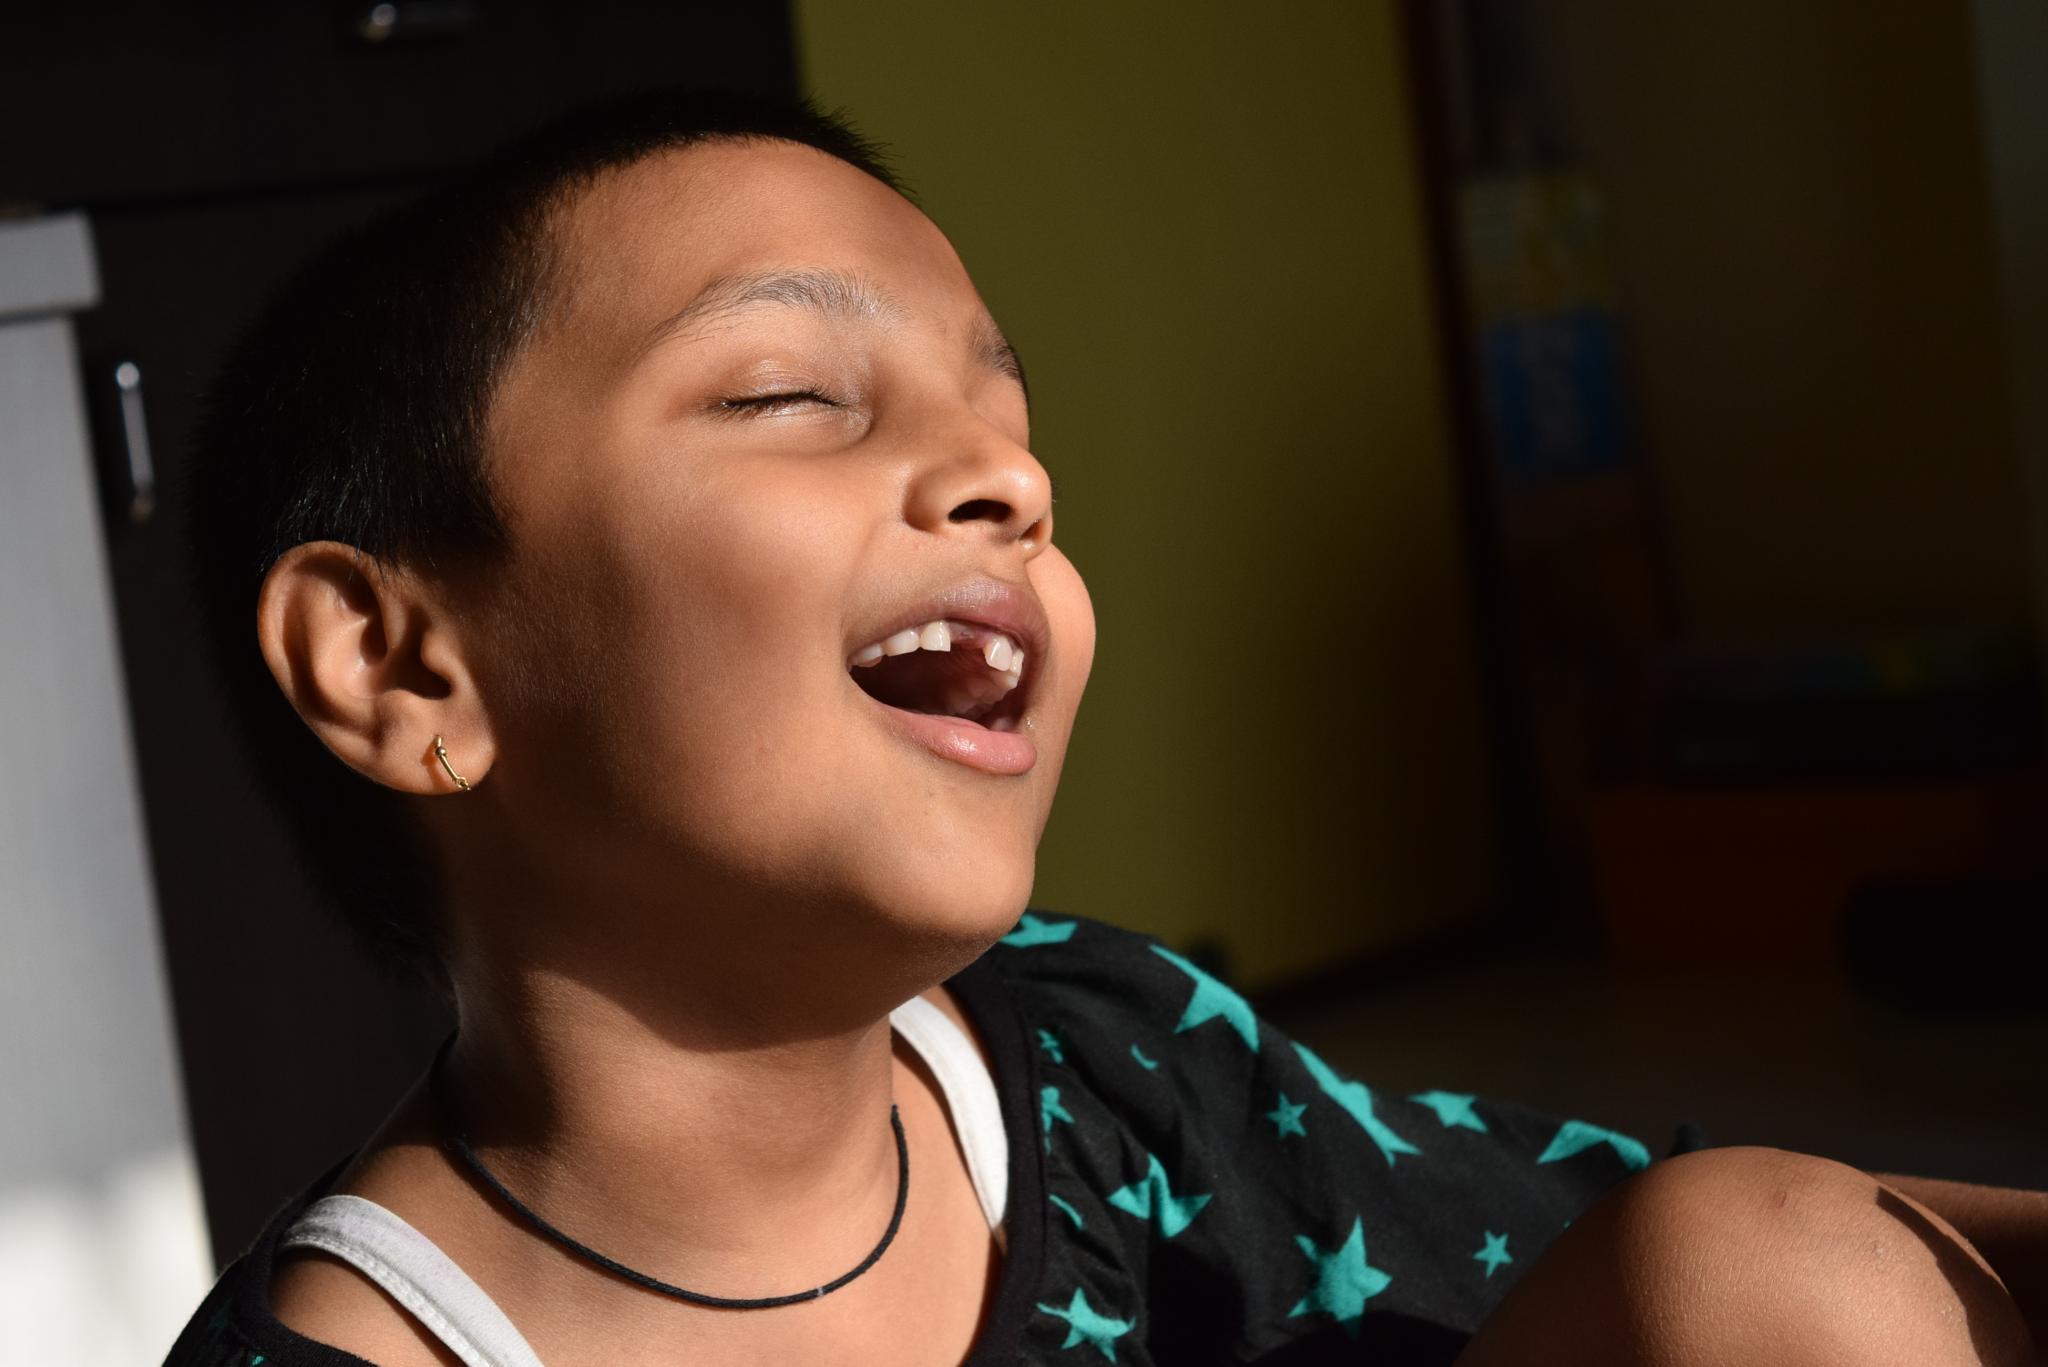 Child portrait  by Sameer Kharade